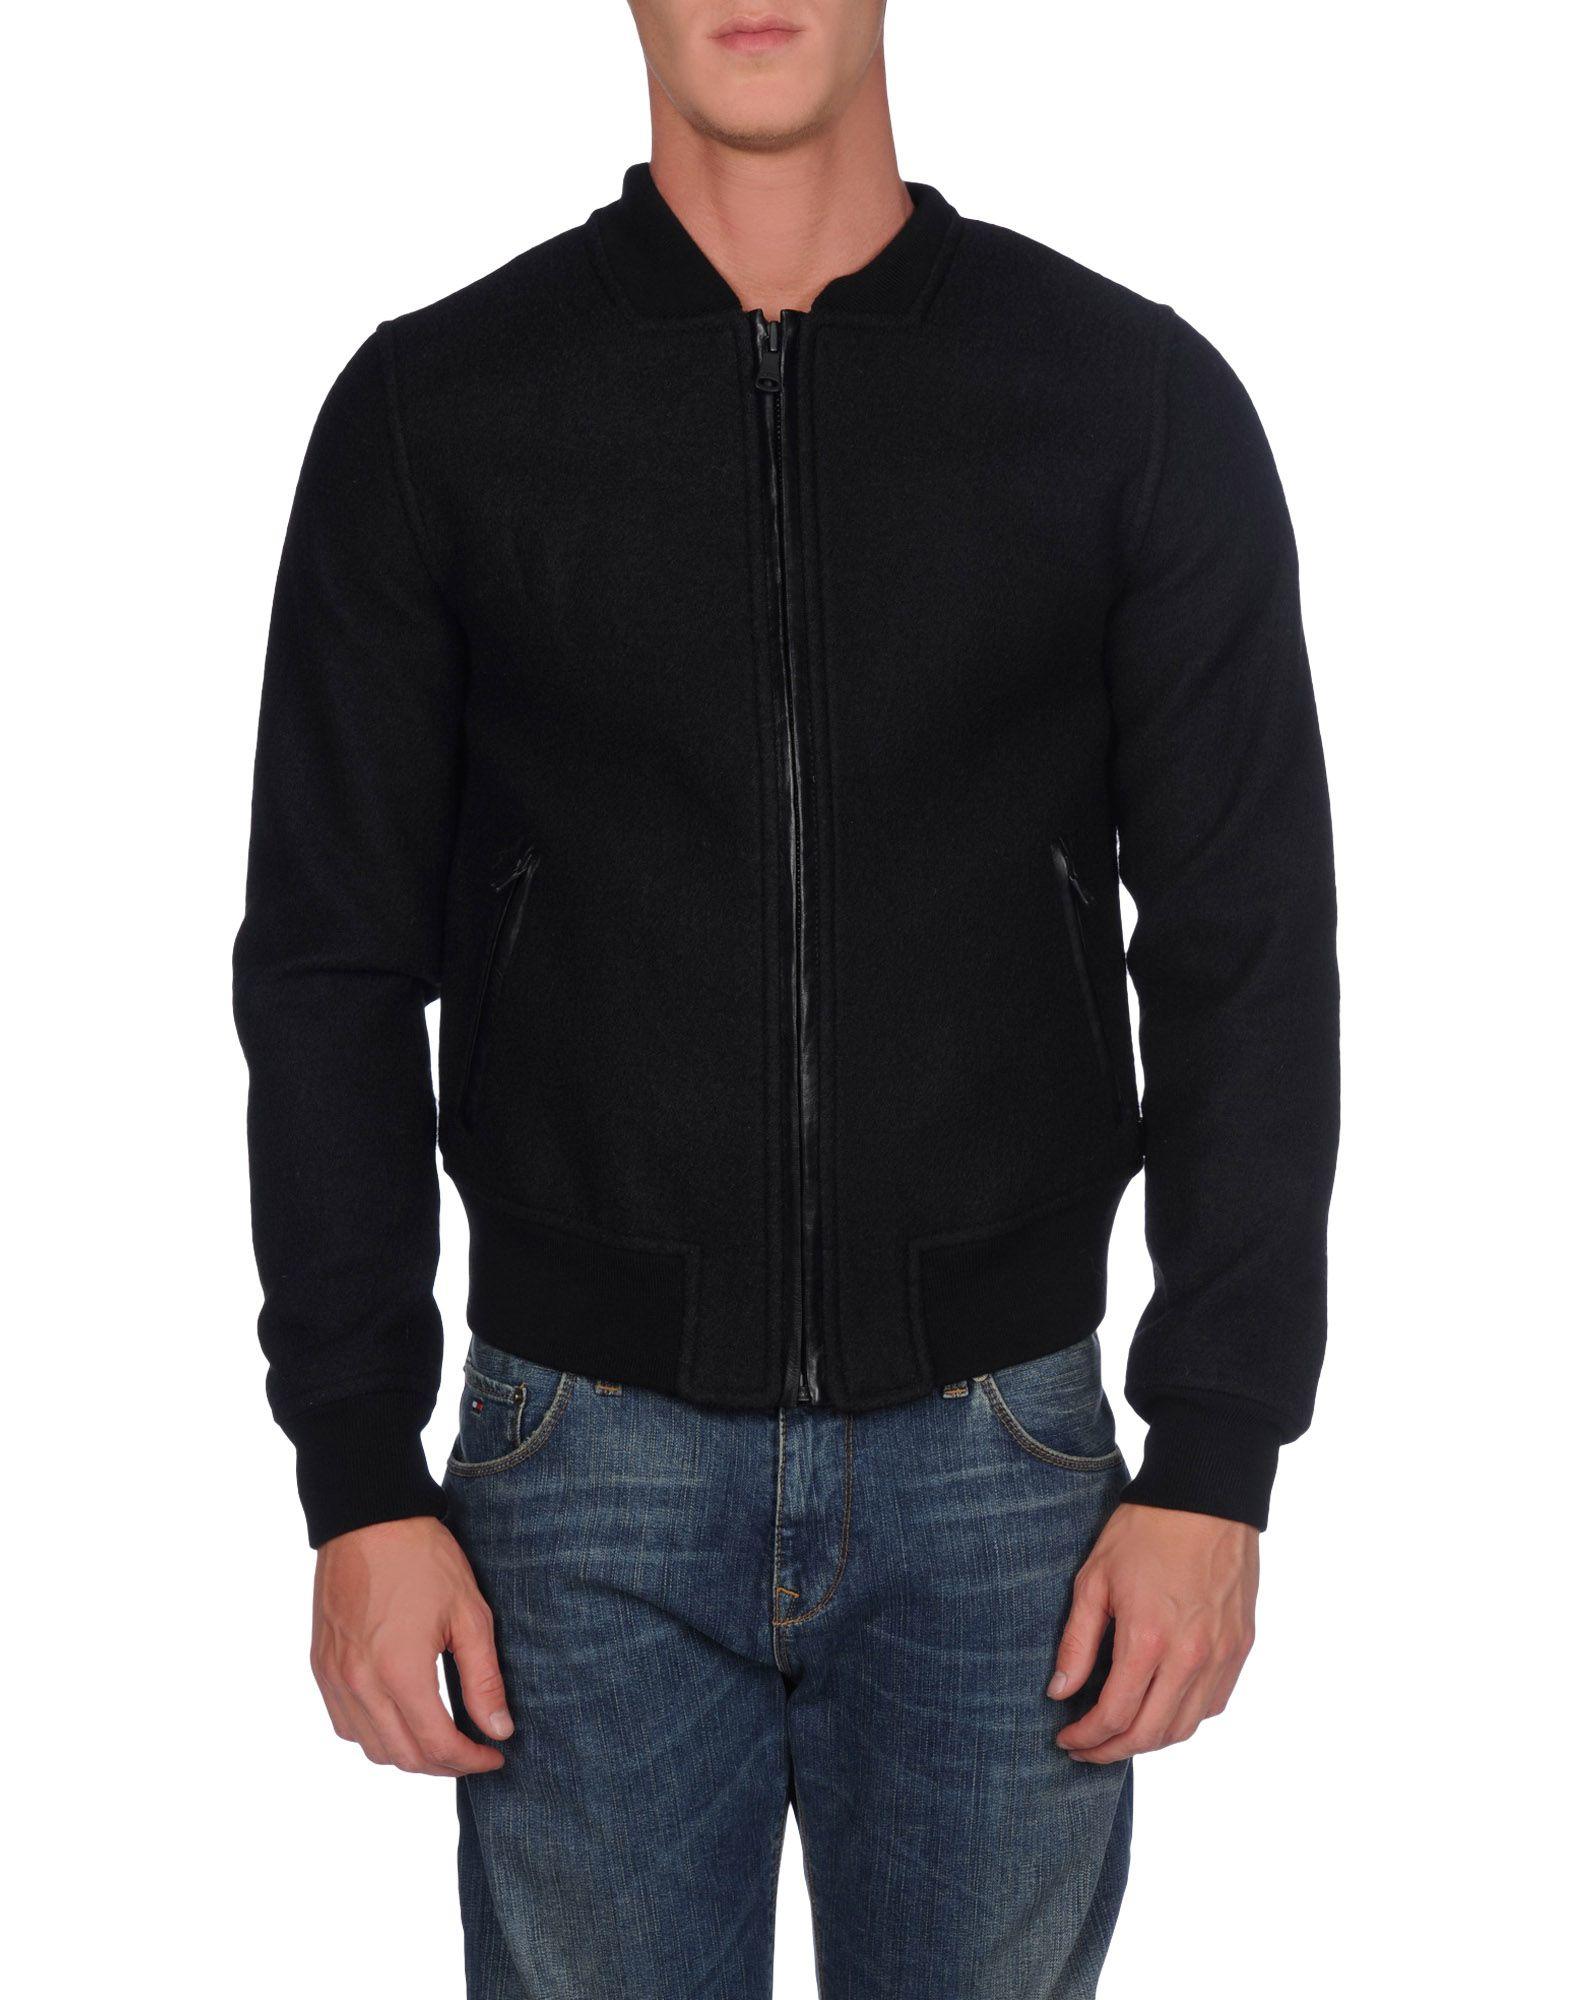 Calvin klein jeans Jacket in Black | Lyst